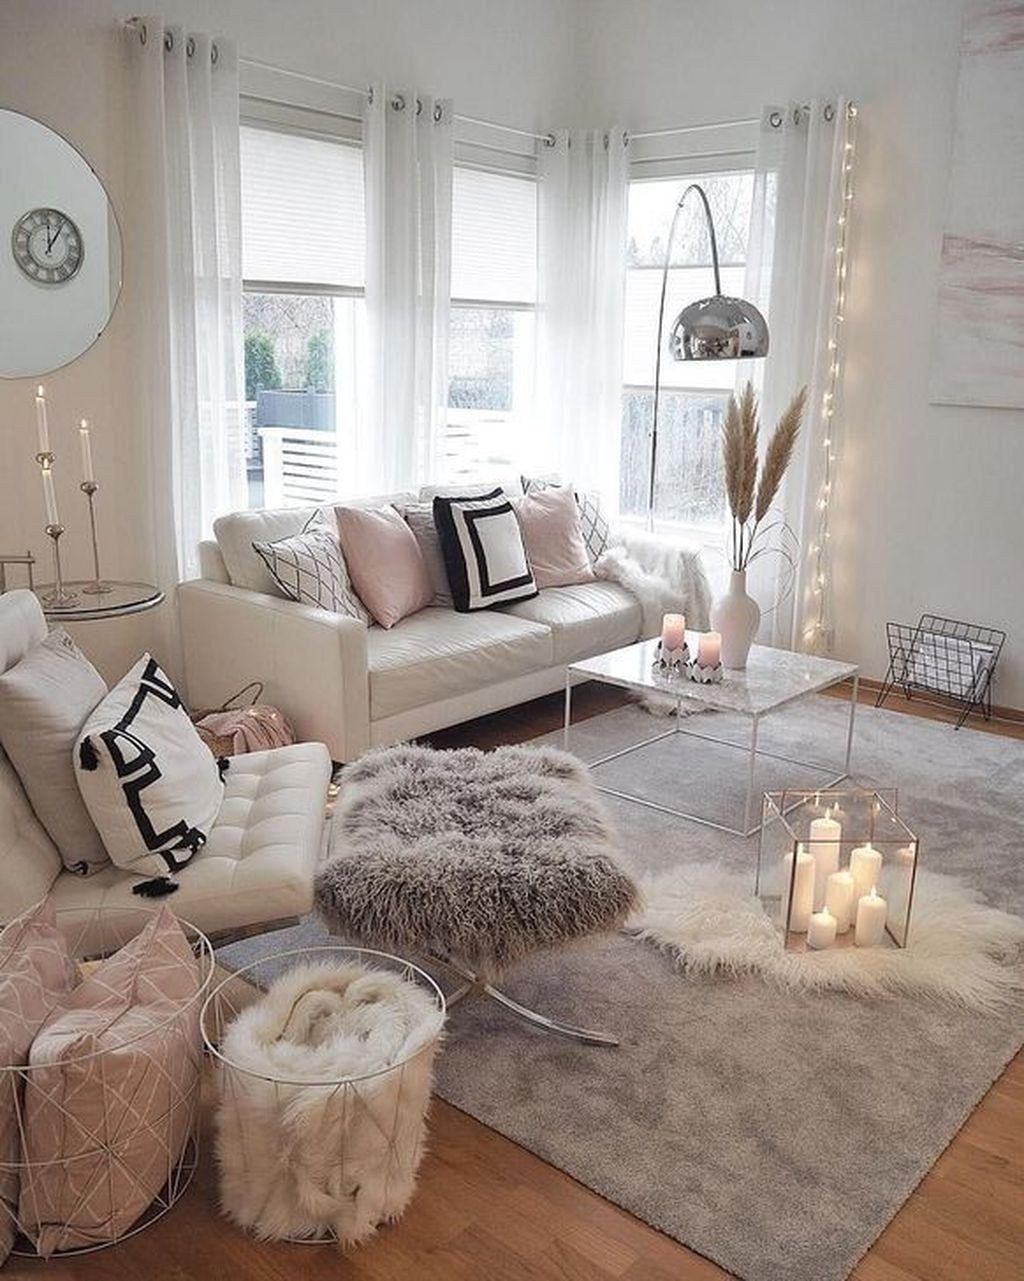 The White Cozy Living Room